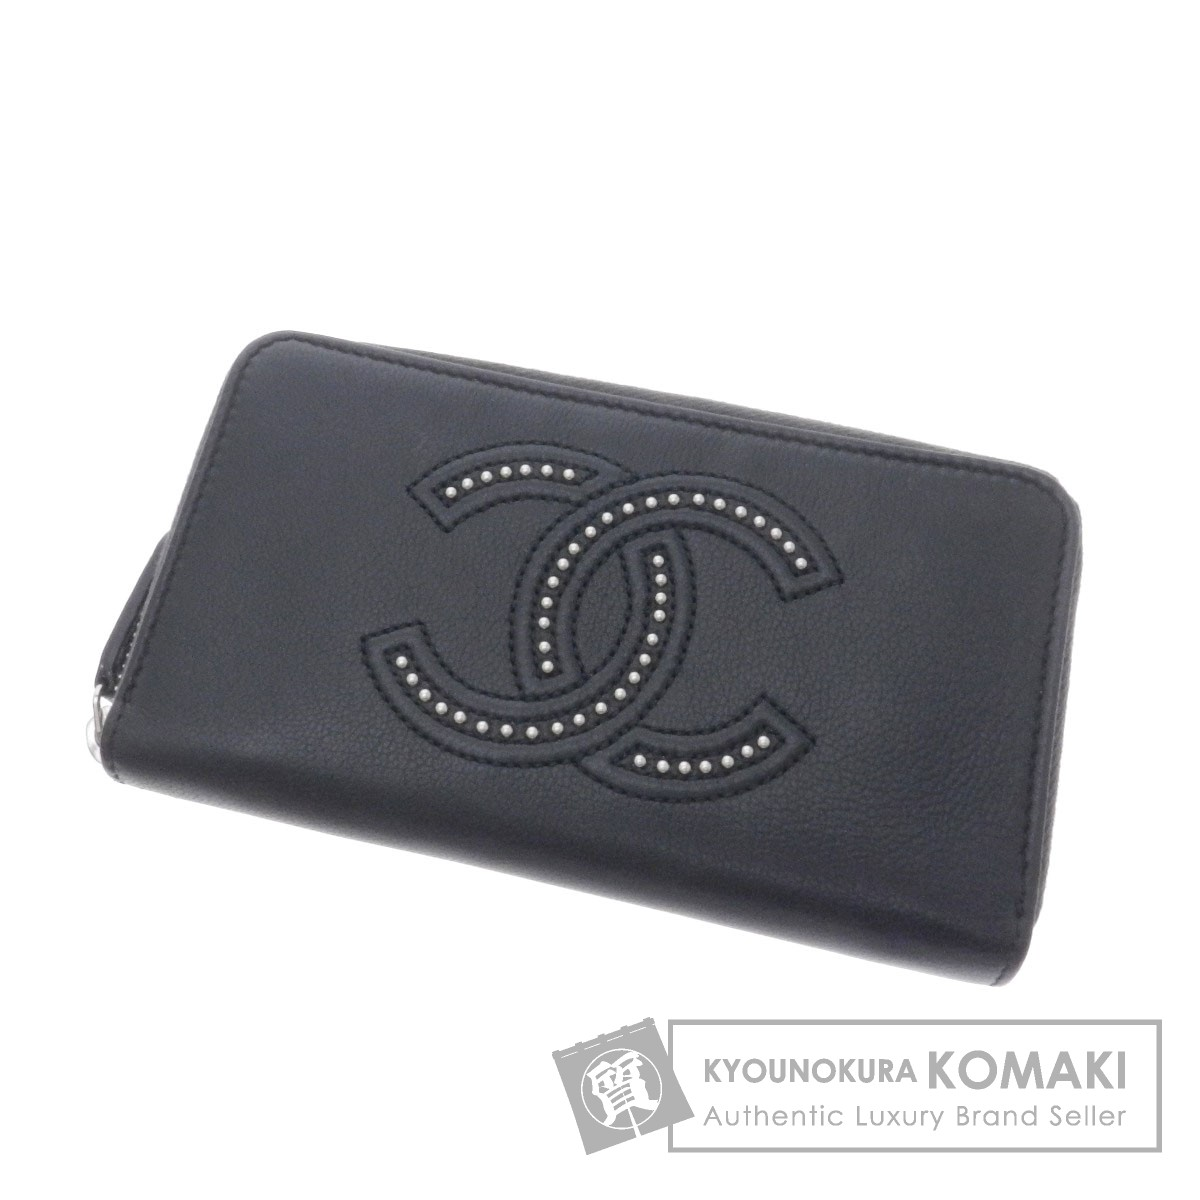 CHANEL ラウンドファスナー 二つ折り財布(小銭入れなし) レザー レディース 【中古】【シャネル】